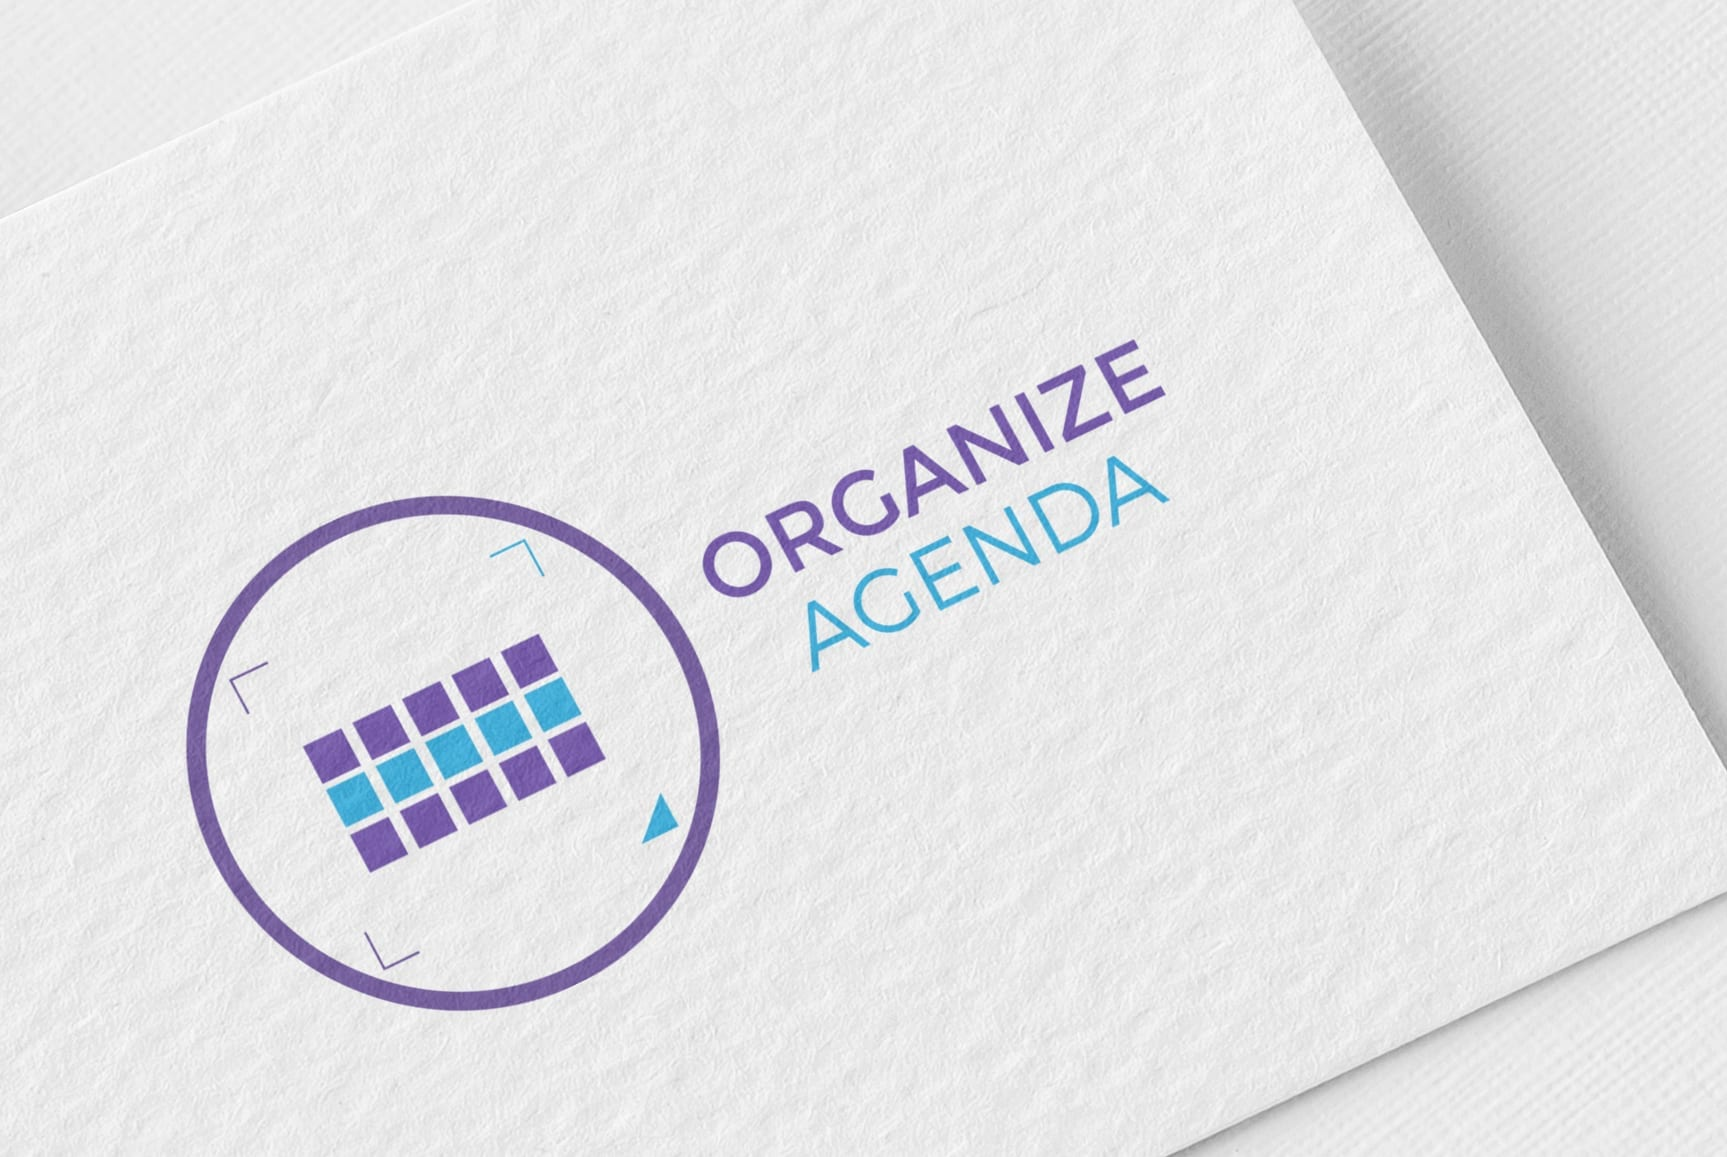 Identidade visual da empresa Organize Agenda